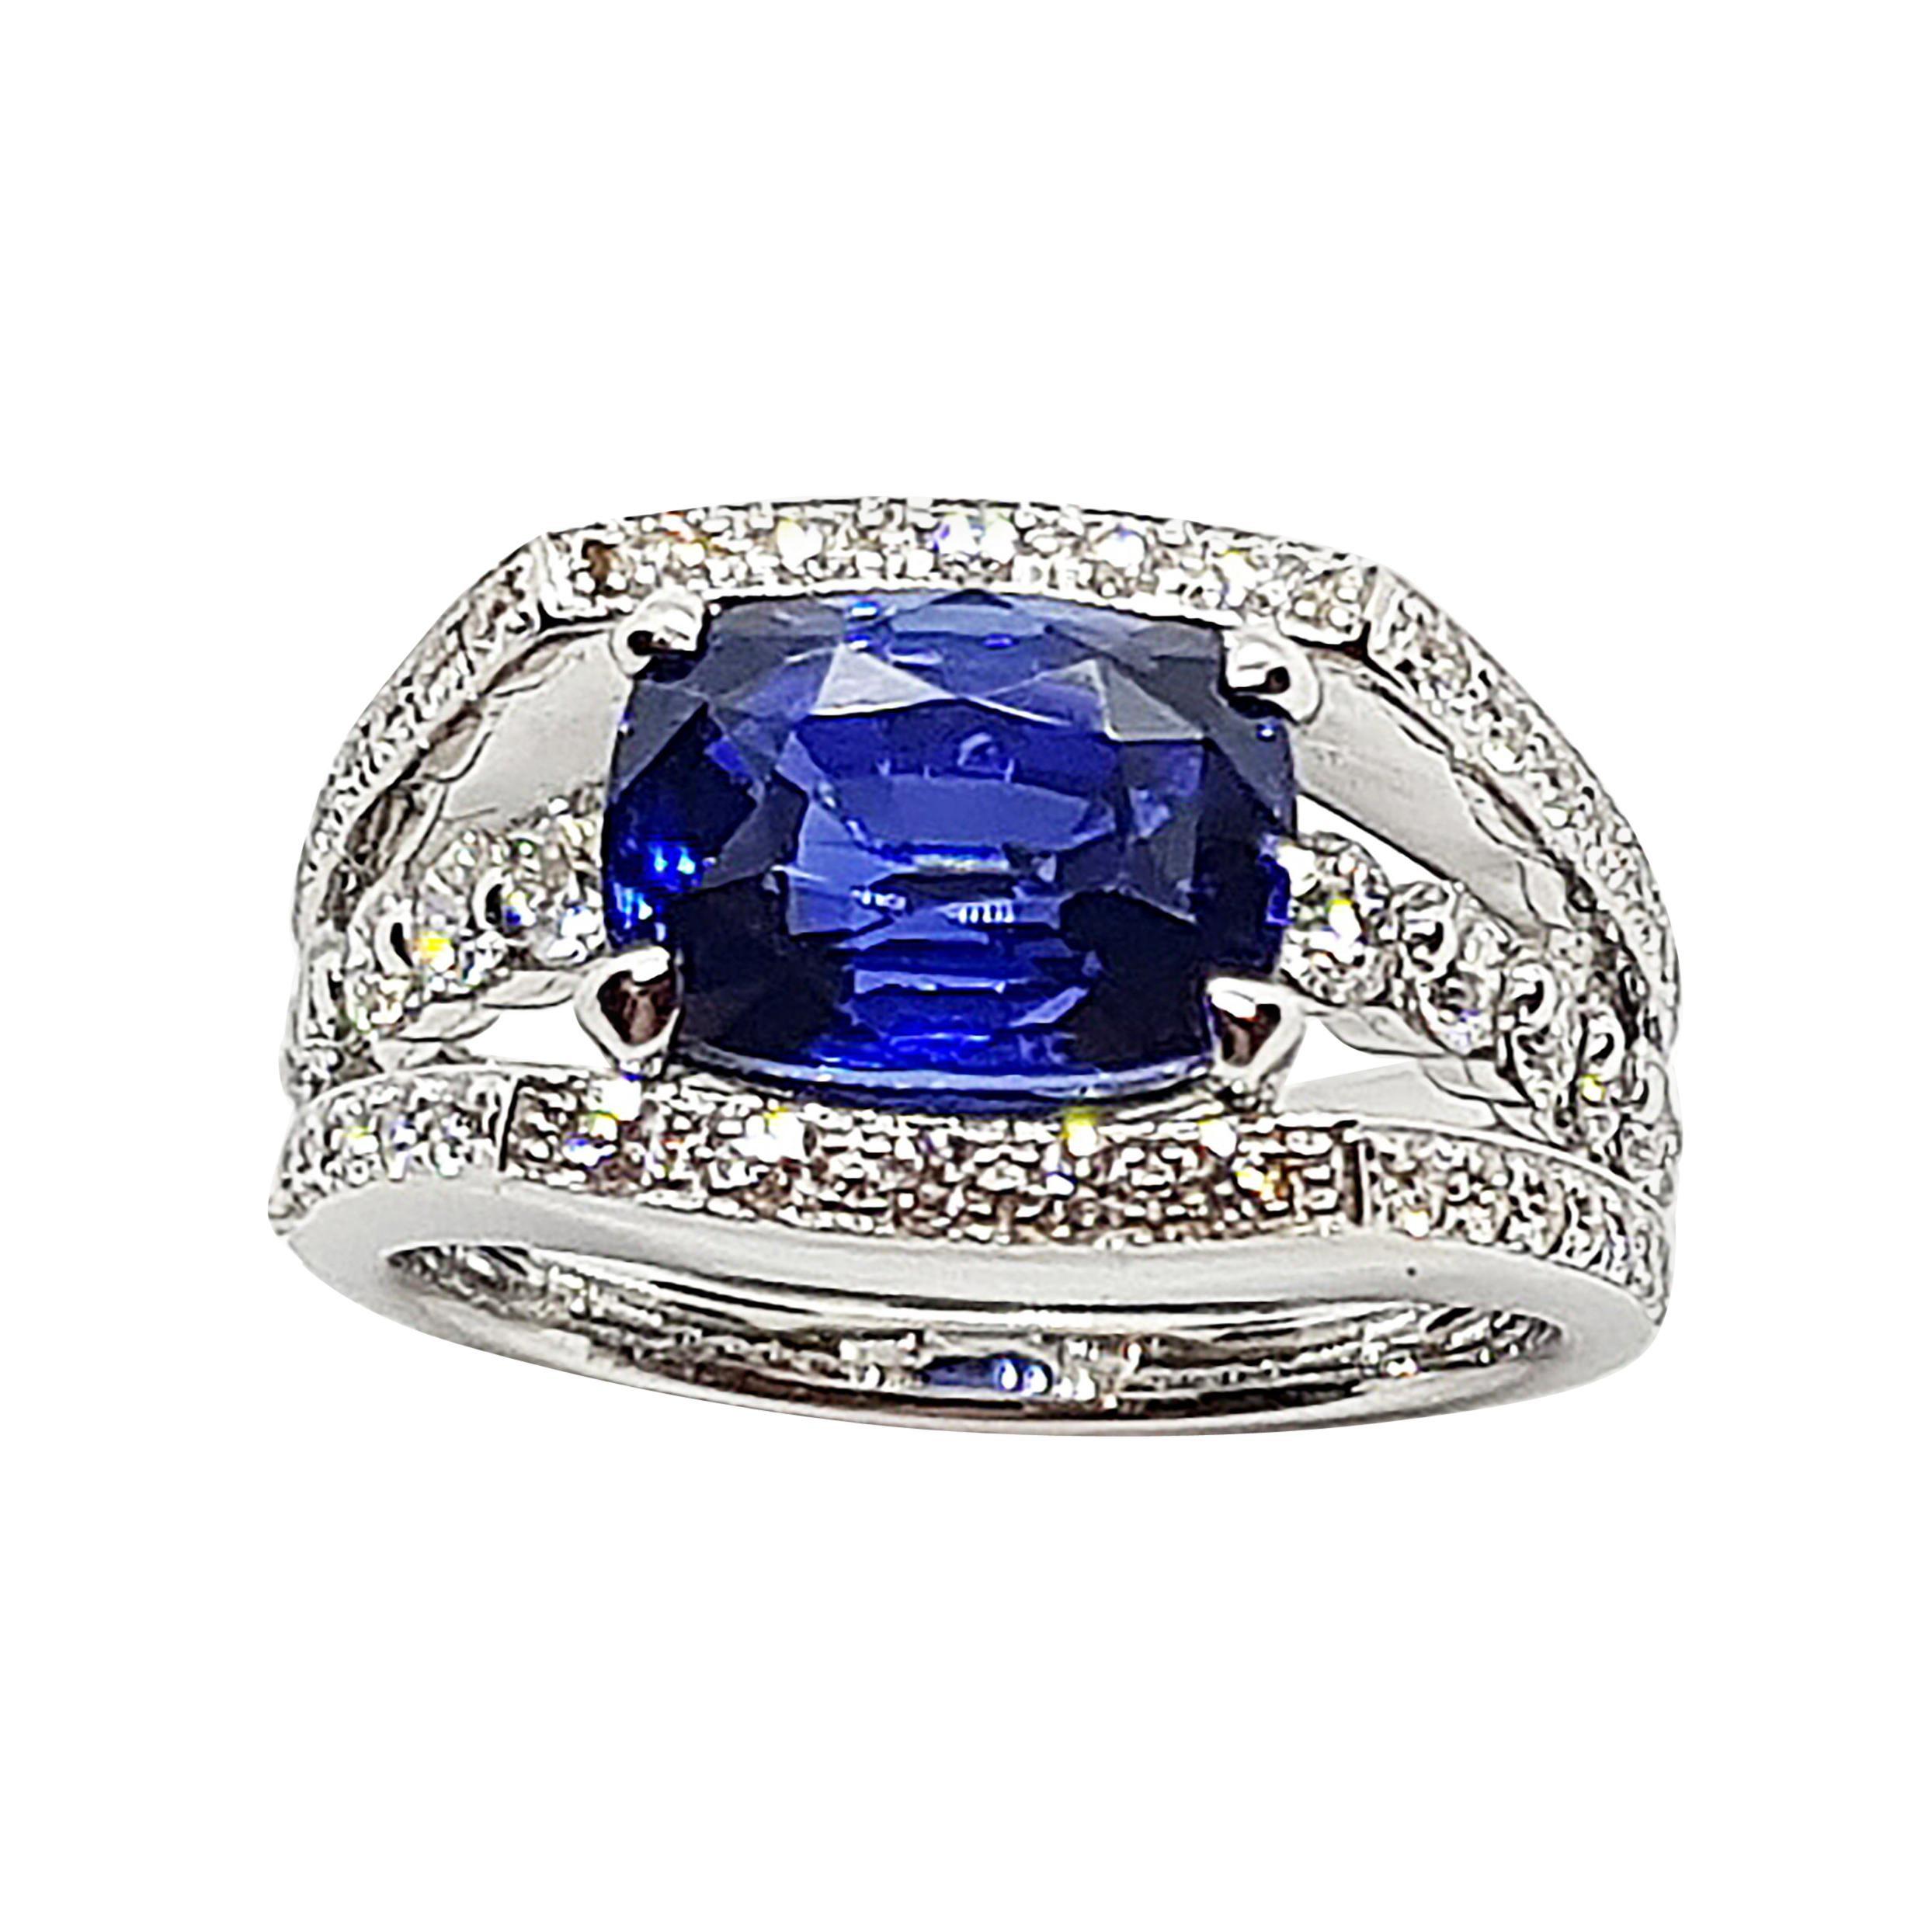 Certified Ceylon Blue Sapphire with Diamond Ring Set in 18 Karat White Gold